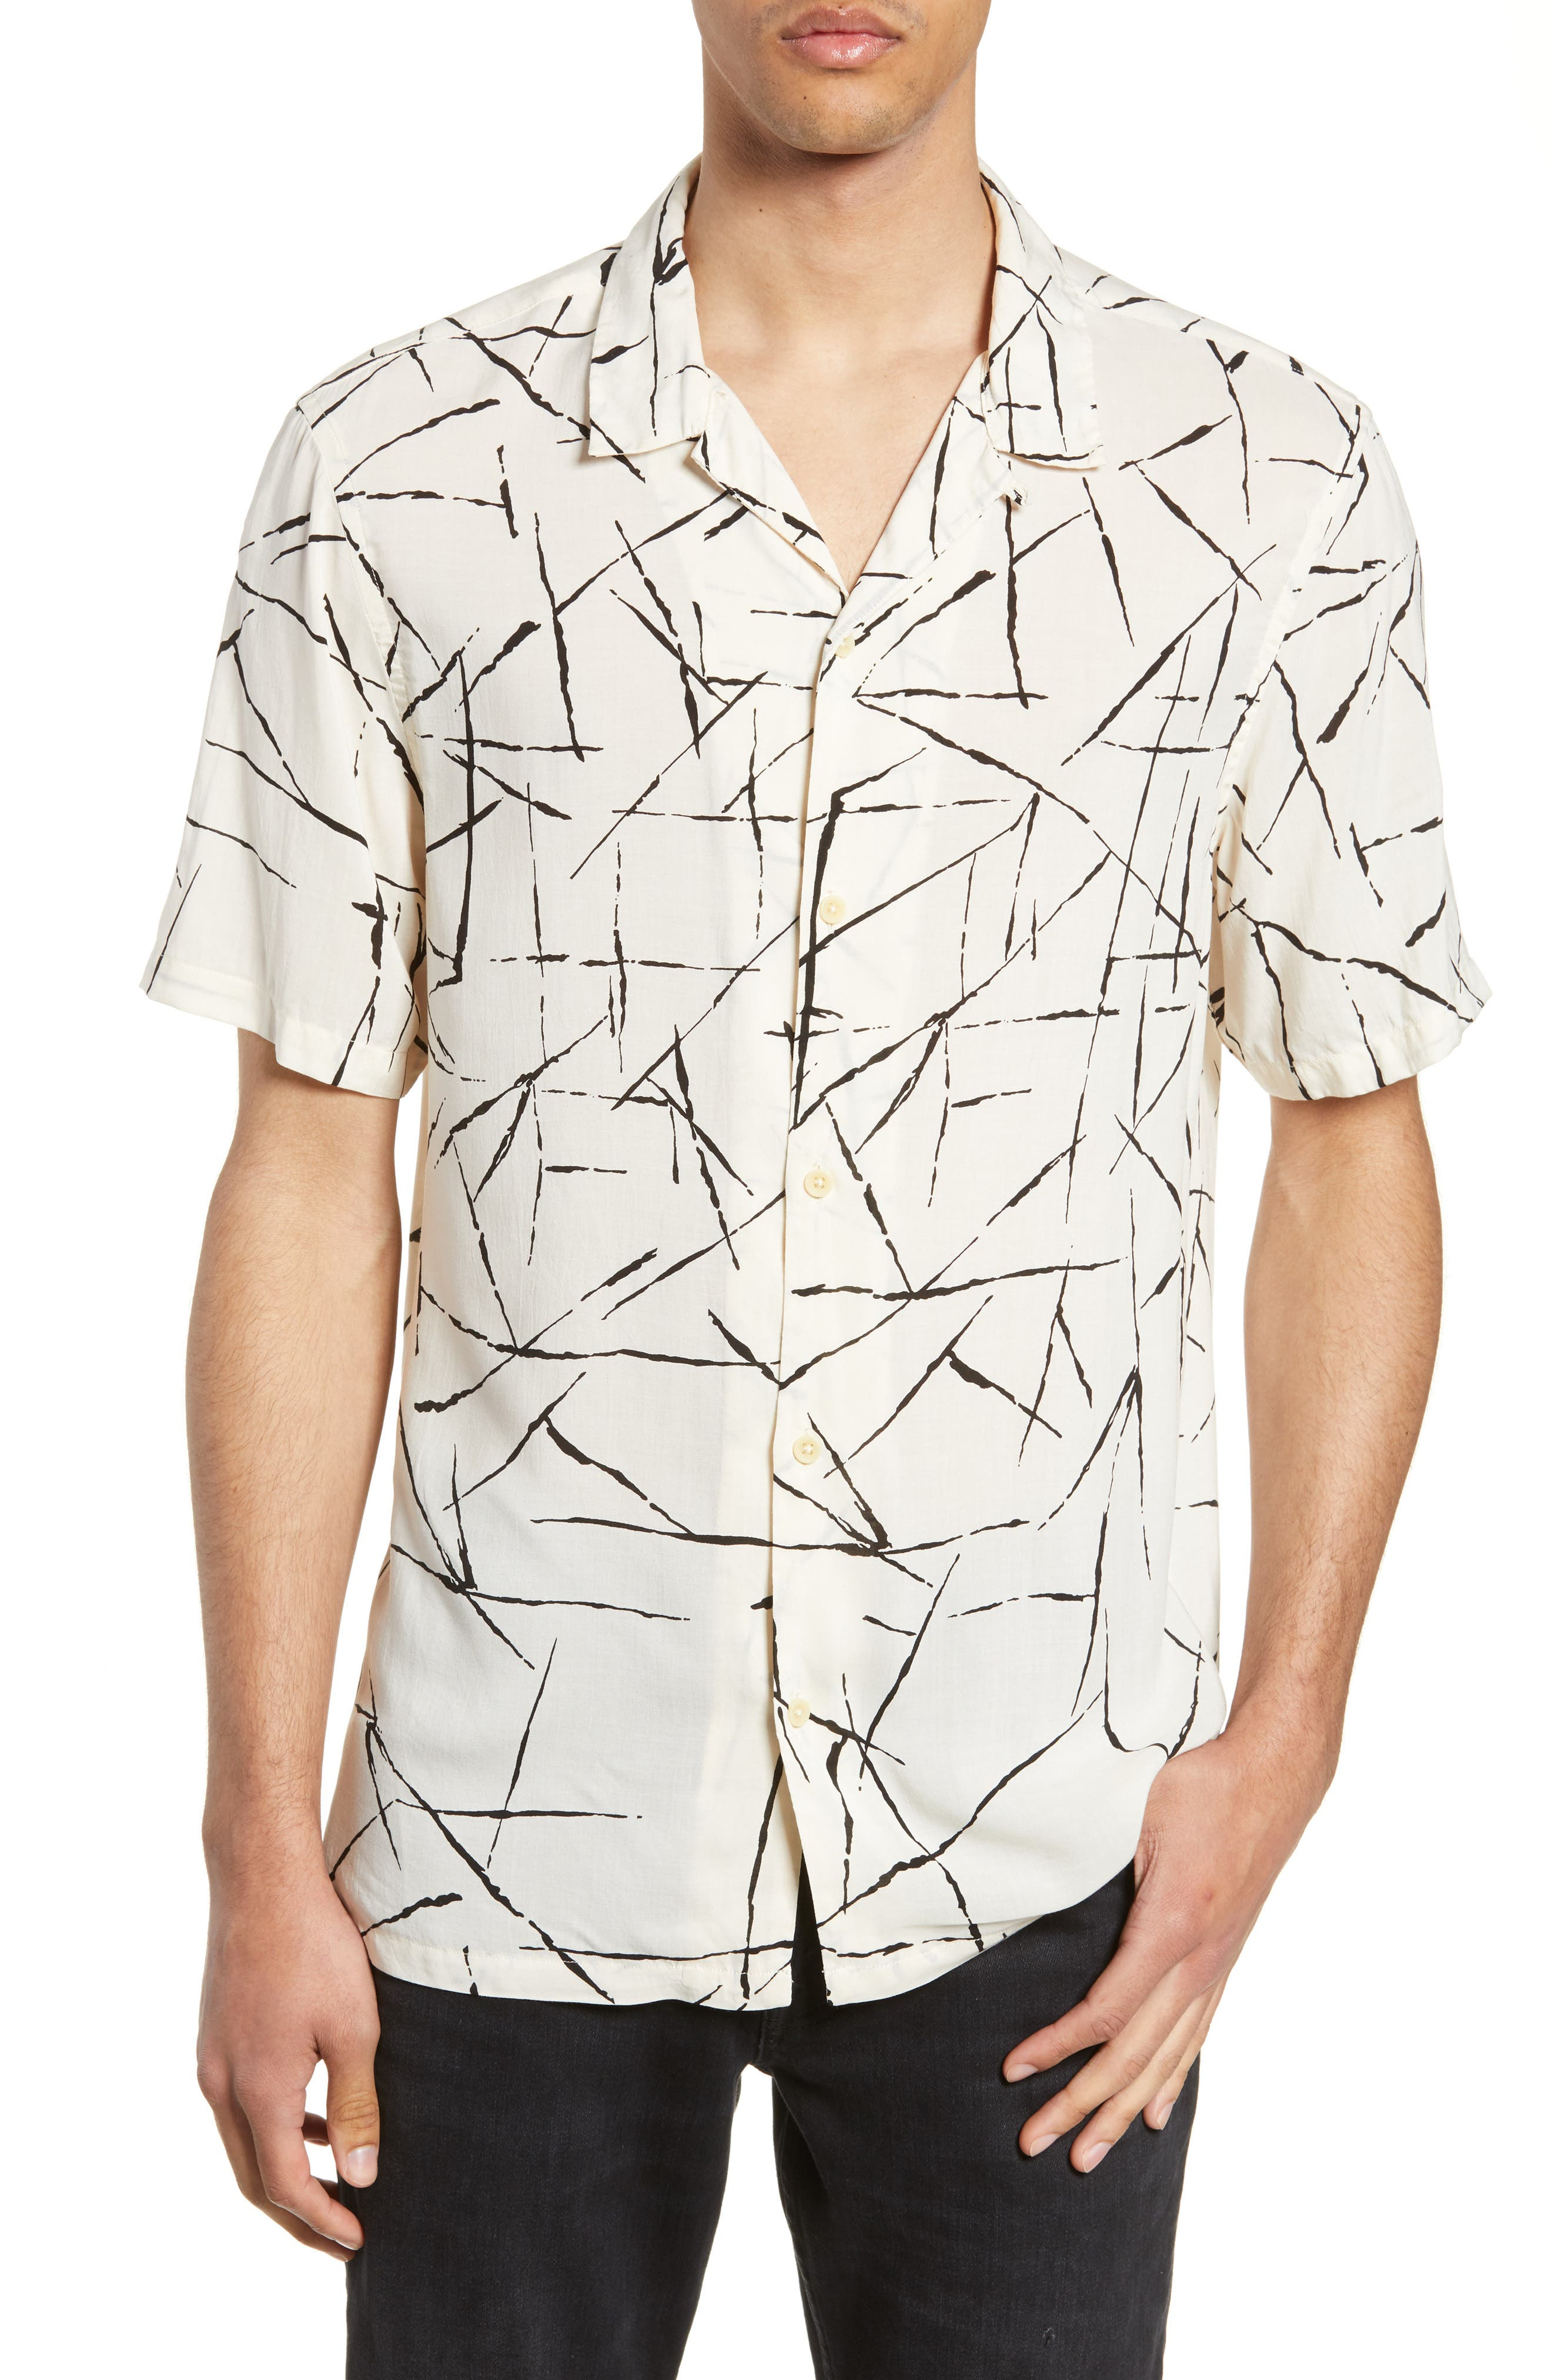 ALLSAINTS, Burma Classic Shirt, Main thumbnail 1, color, ECRU WHITE